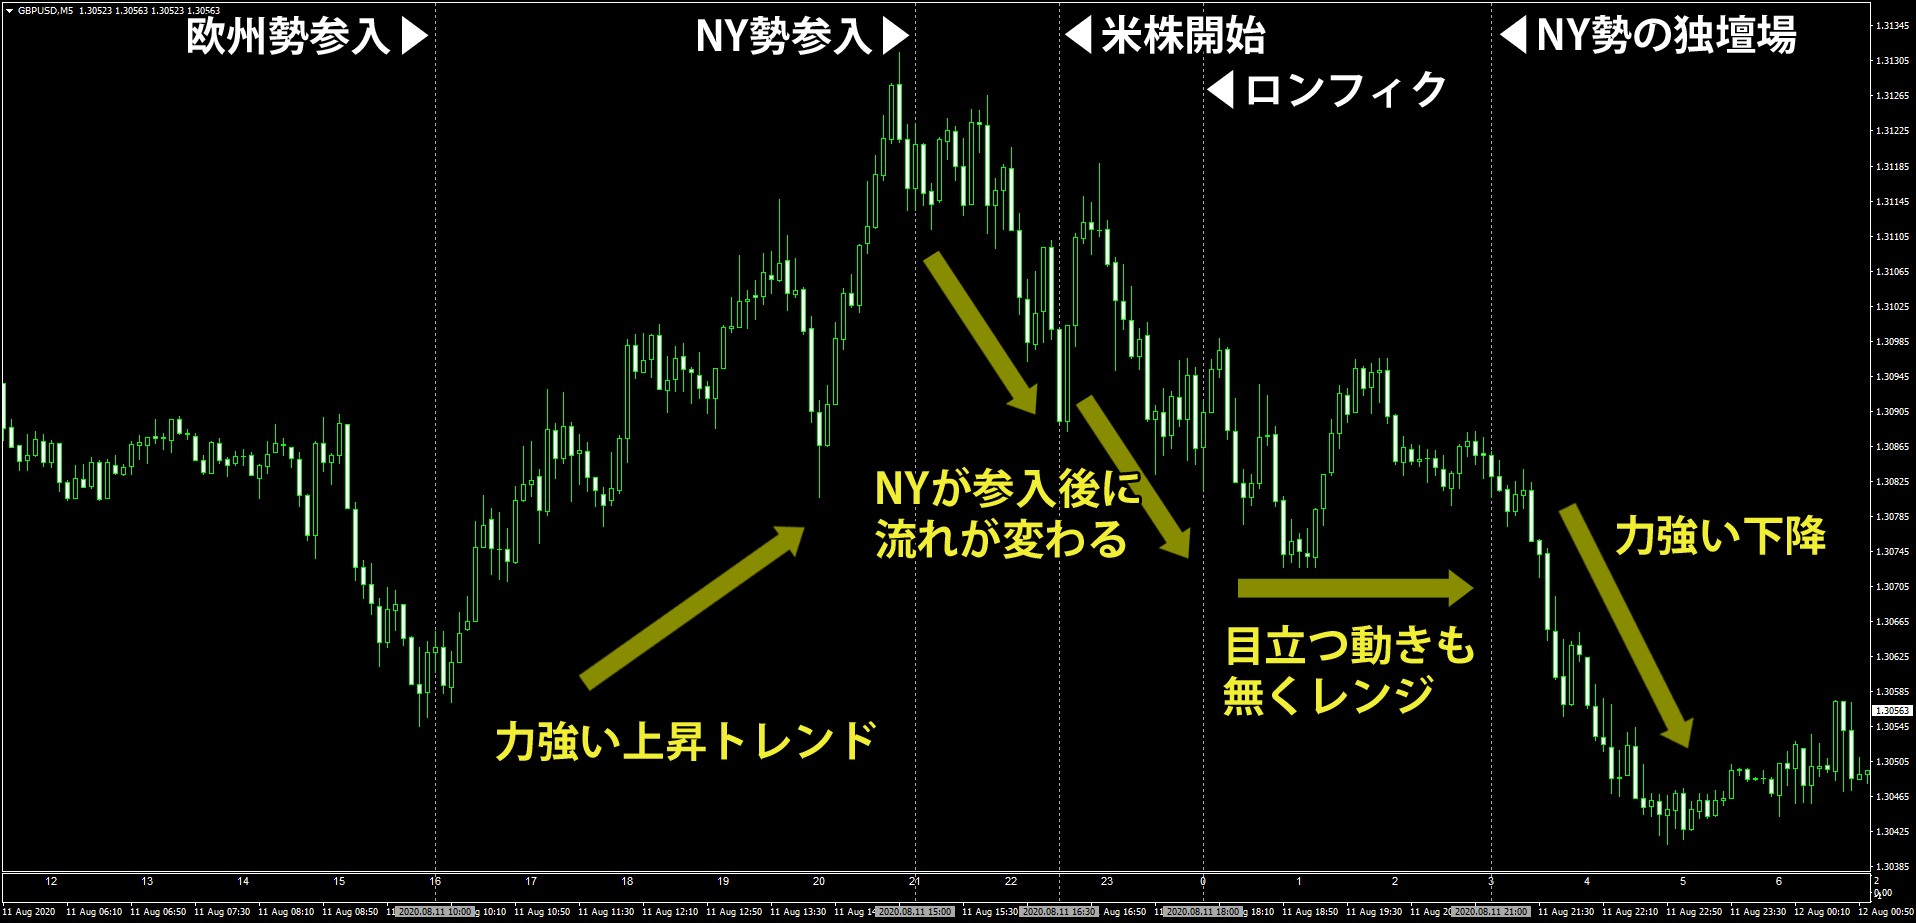 NY時間での特徴的なポンドドルの動き